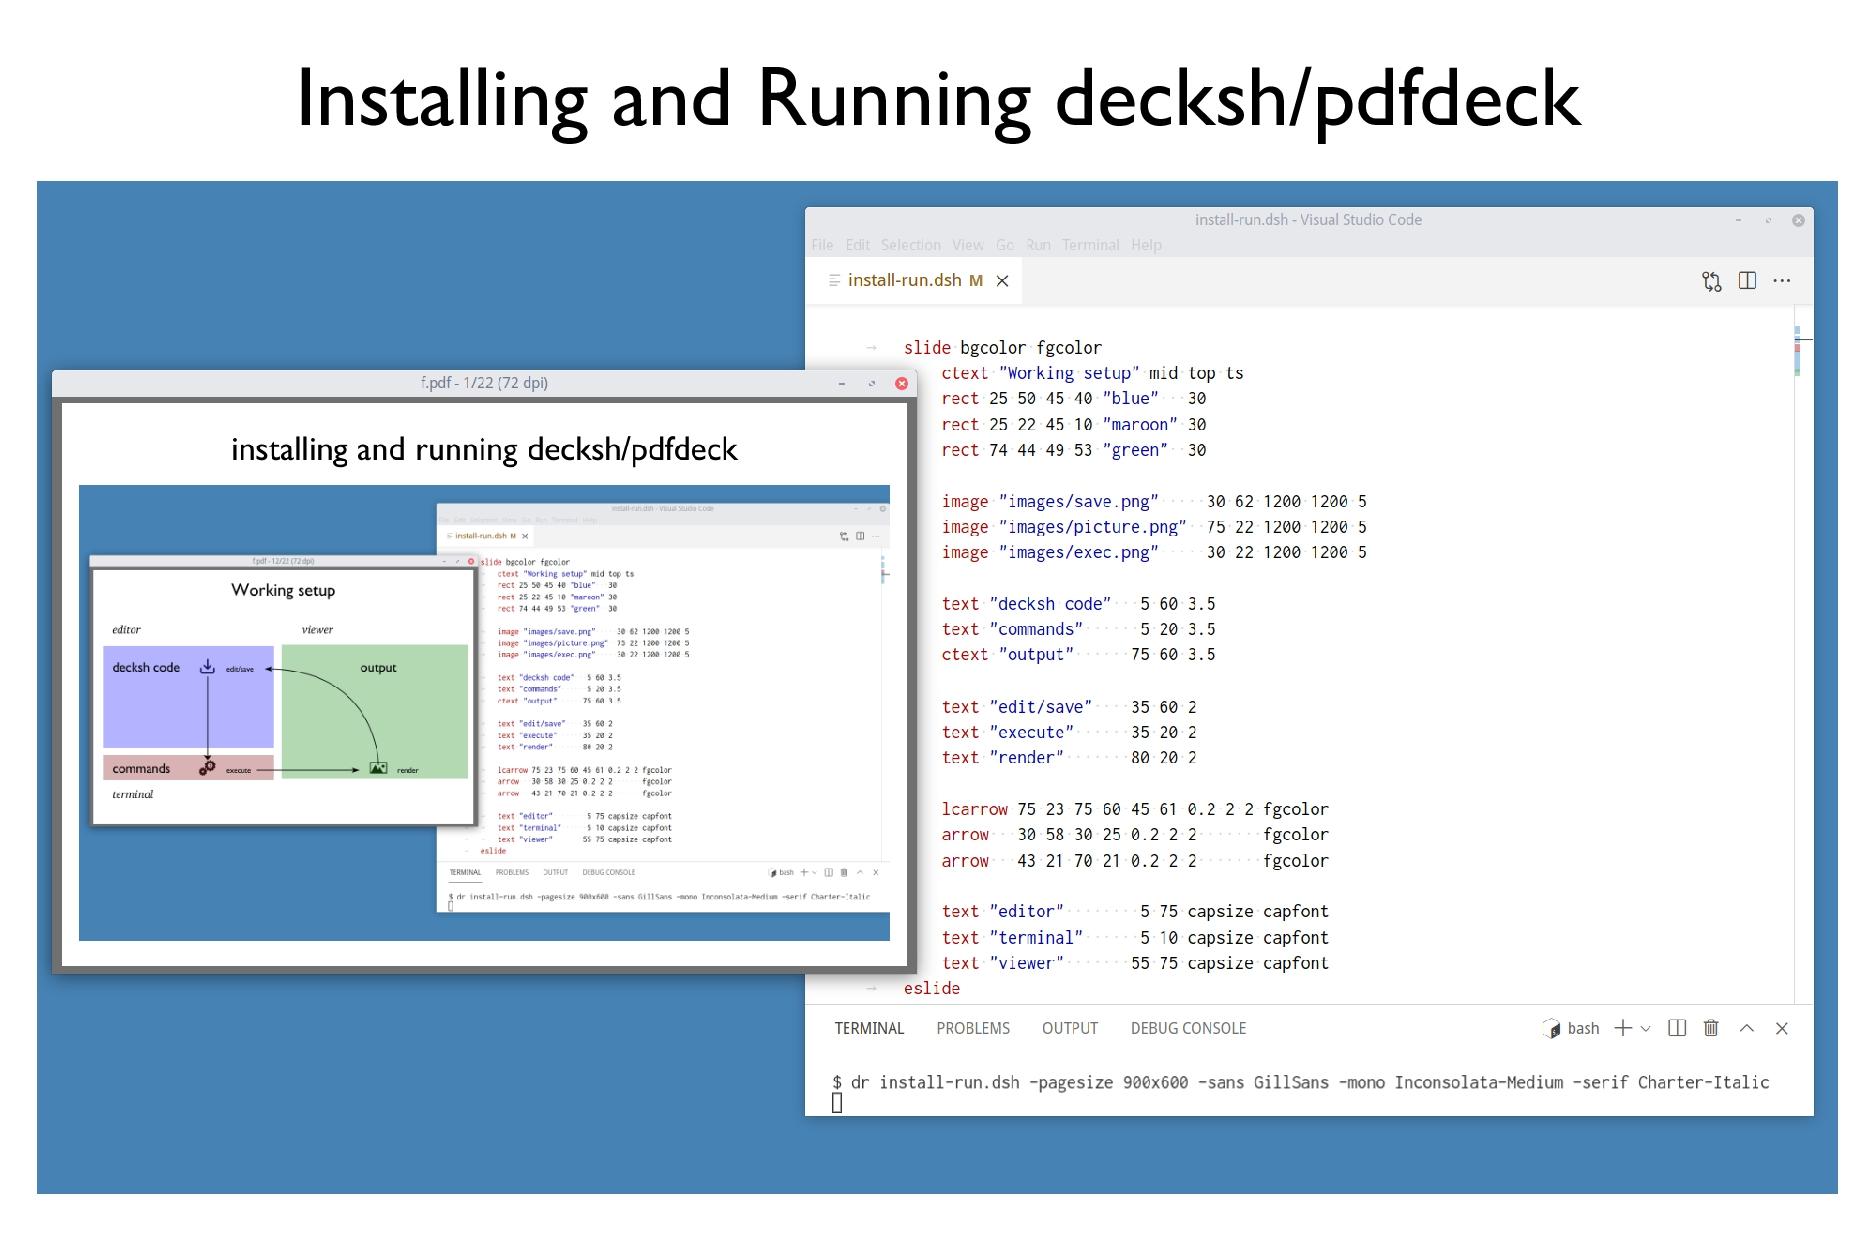 Installing and Running decksh/pdfdeck